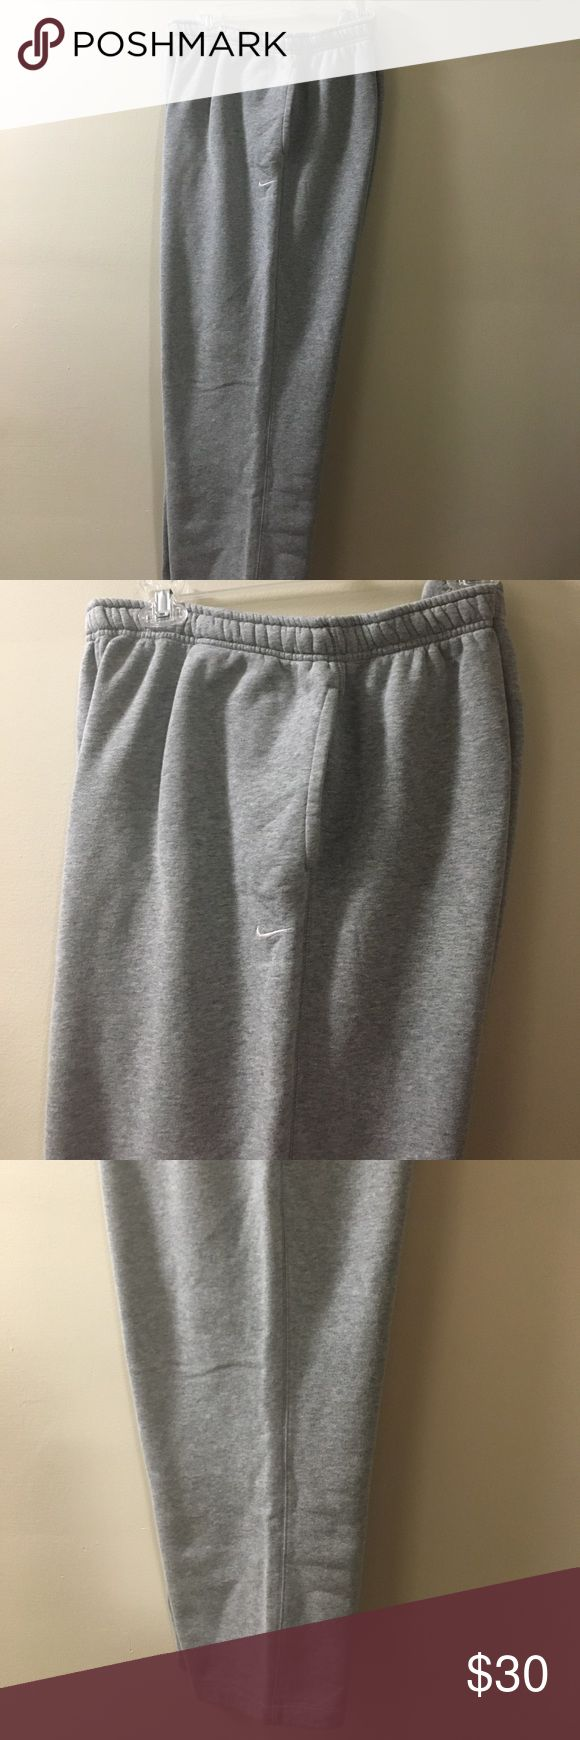 "Niki Big & Tall Activewear Fleece Sweatpants Fit Loose tapered legs. Drawstring flat front elastic waist. Two side slip pockets one back snap pocket. Inseam 33"" Nike Pants Sweatpants & Joggers"